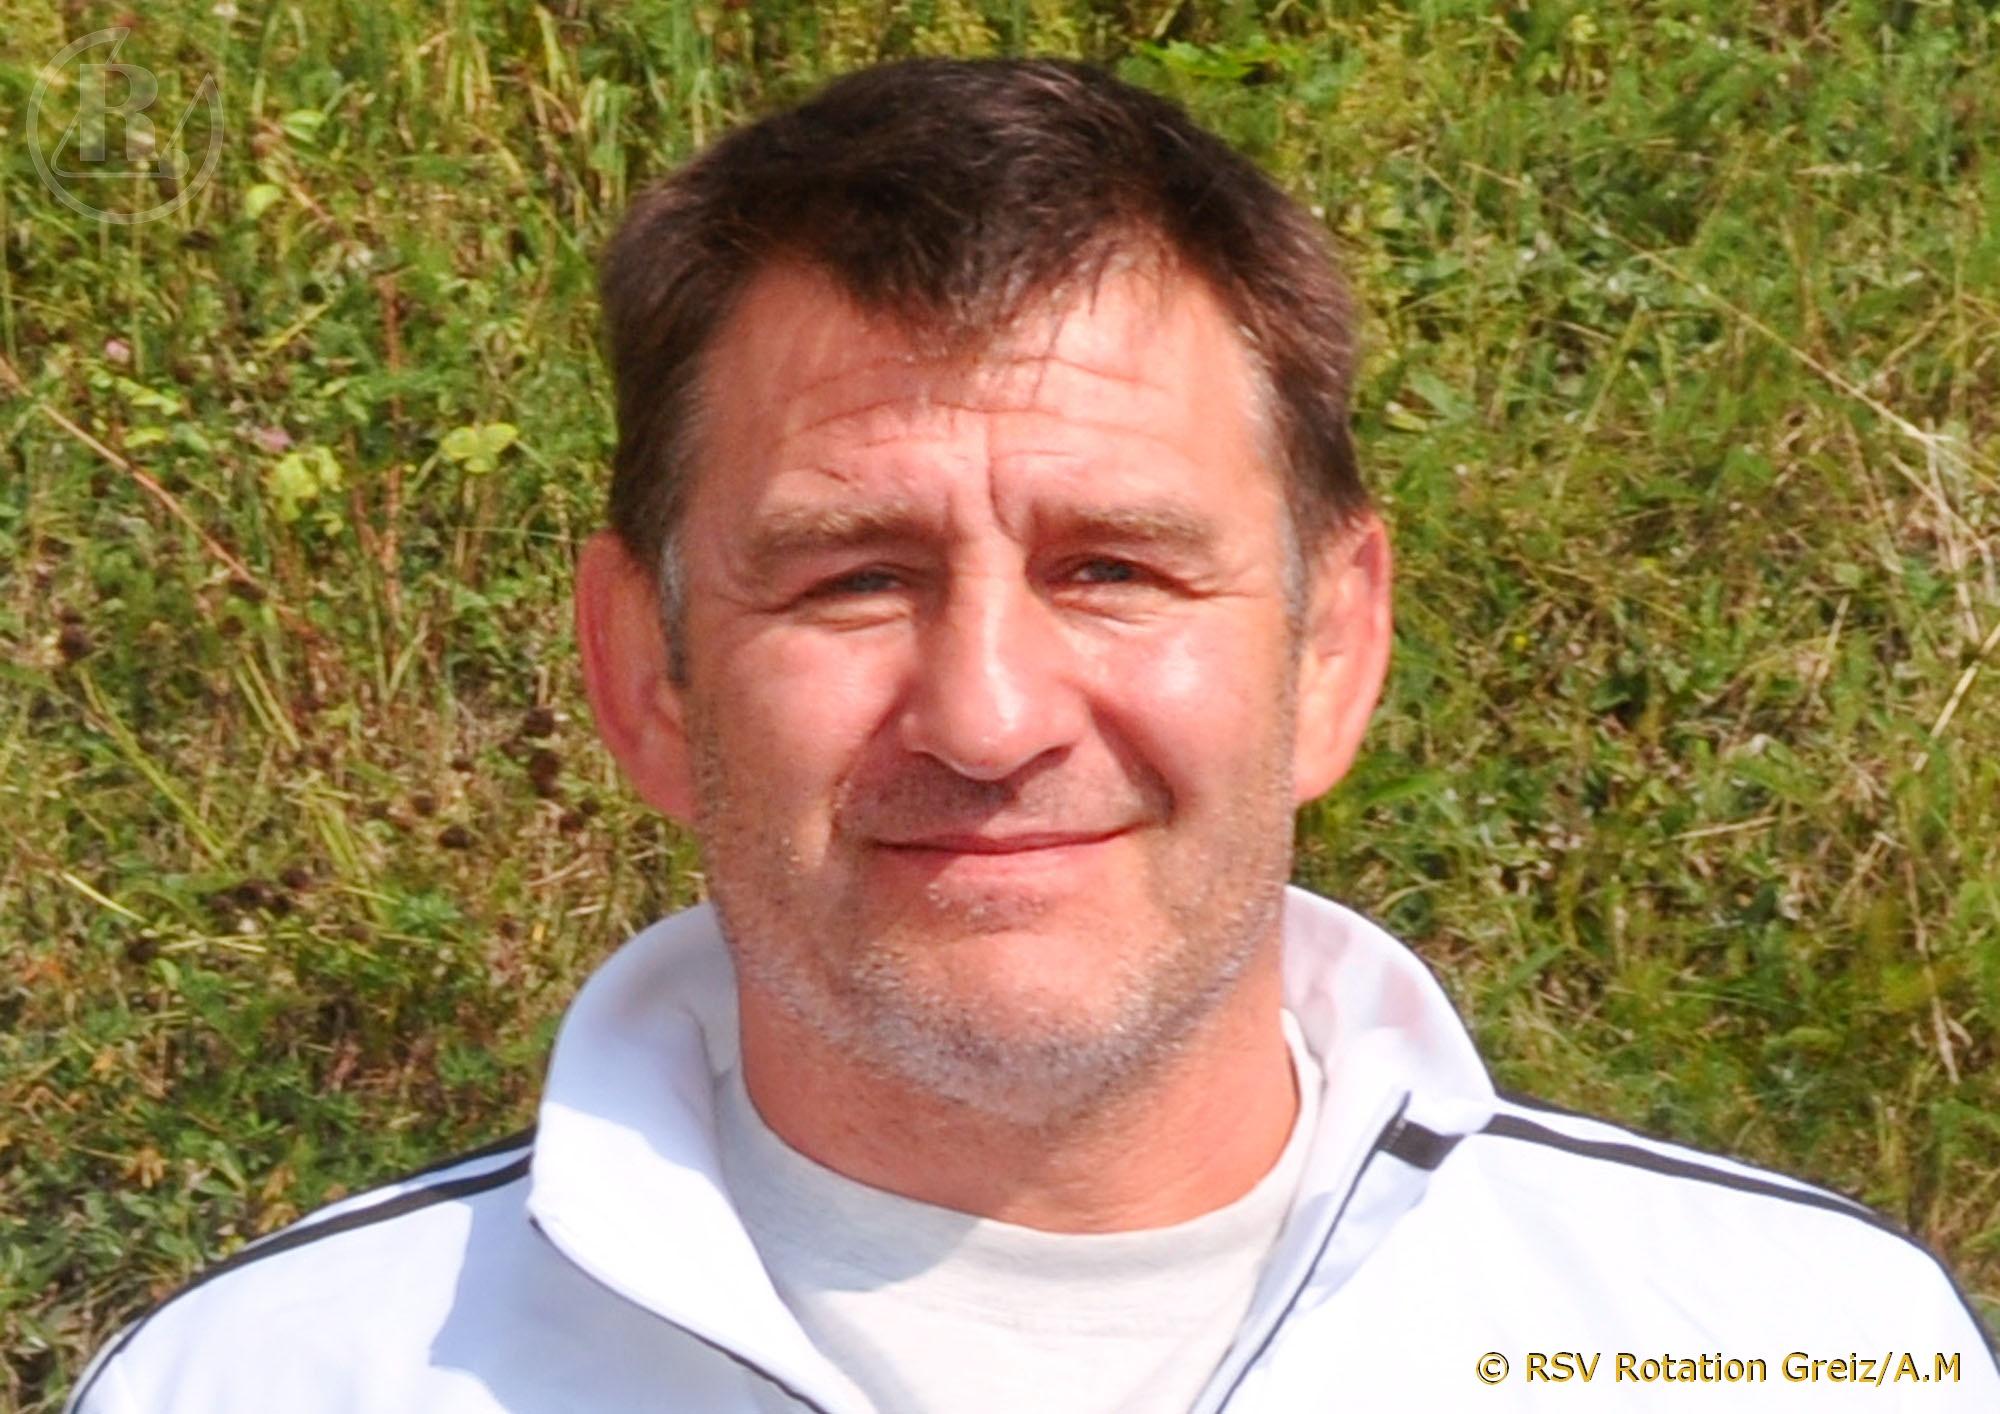 Tino Hempel